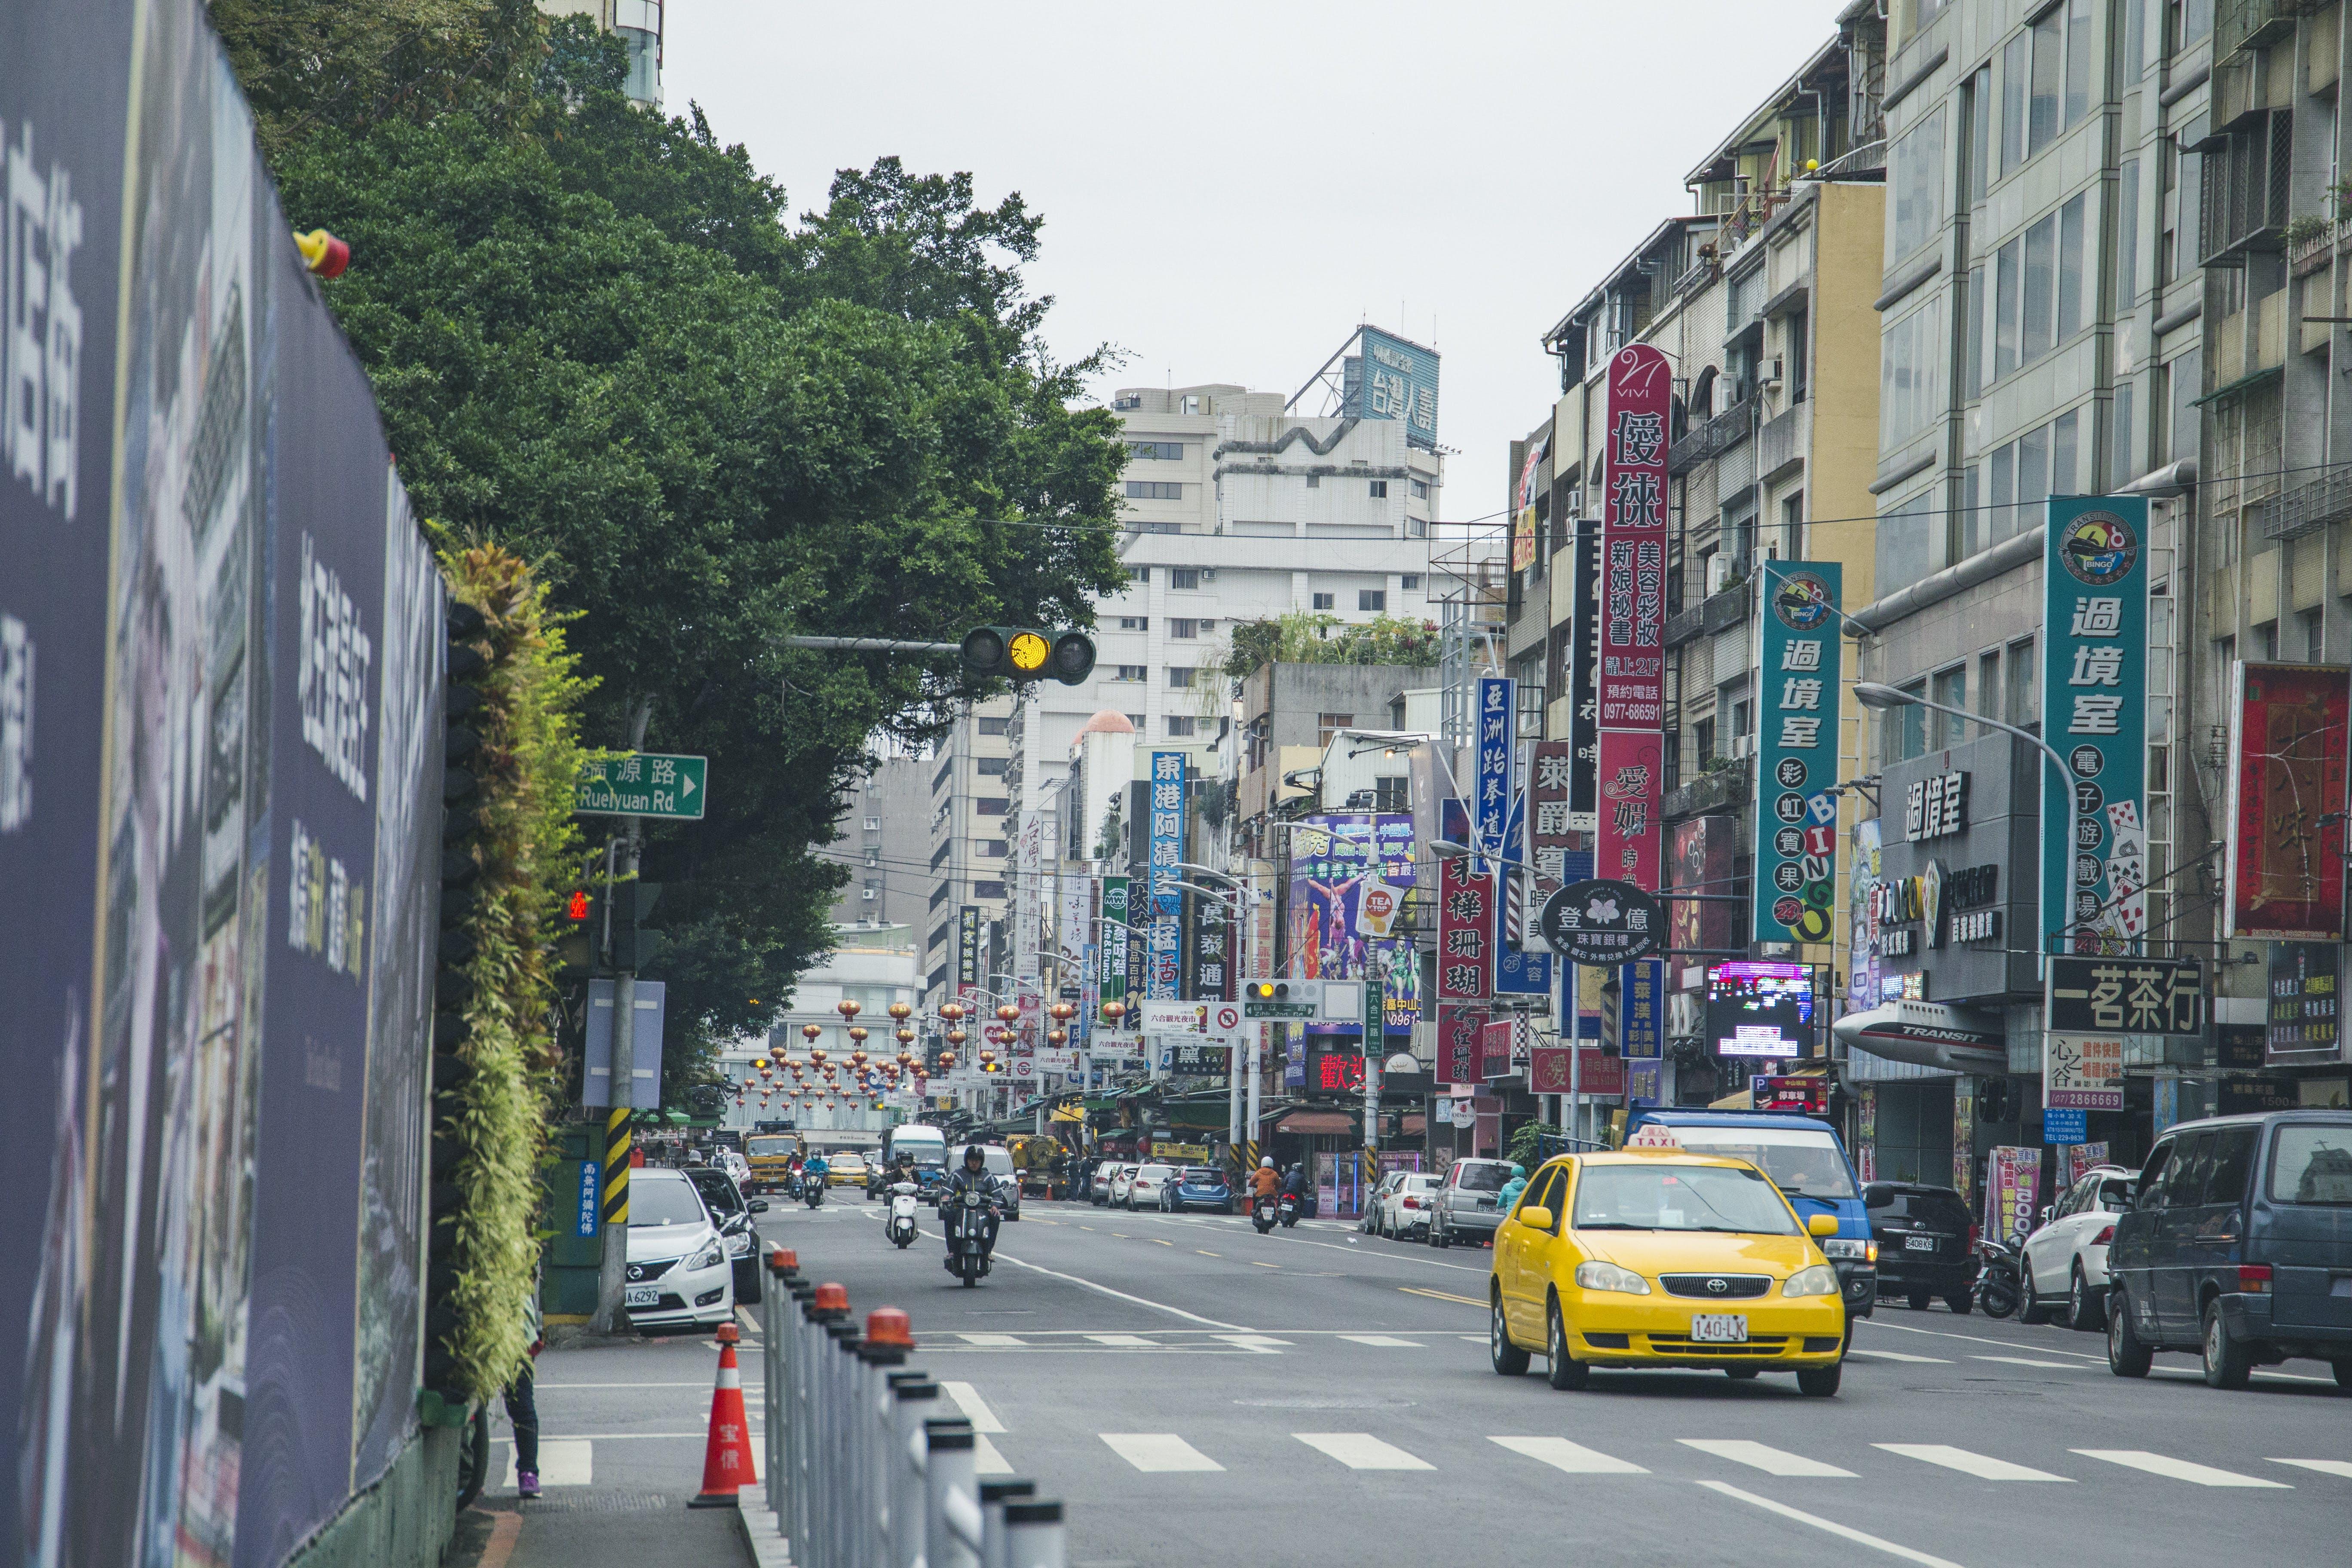 asia, buildings, cars